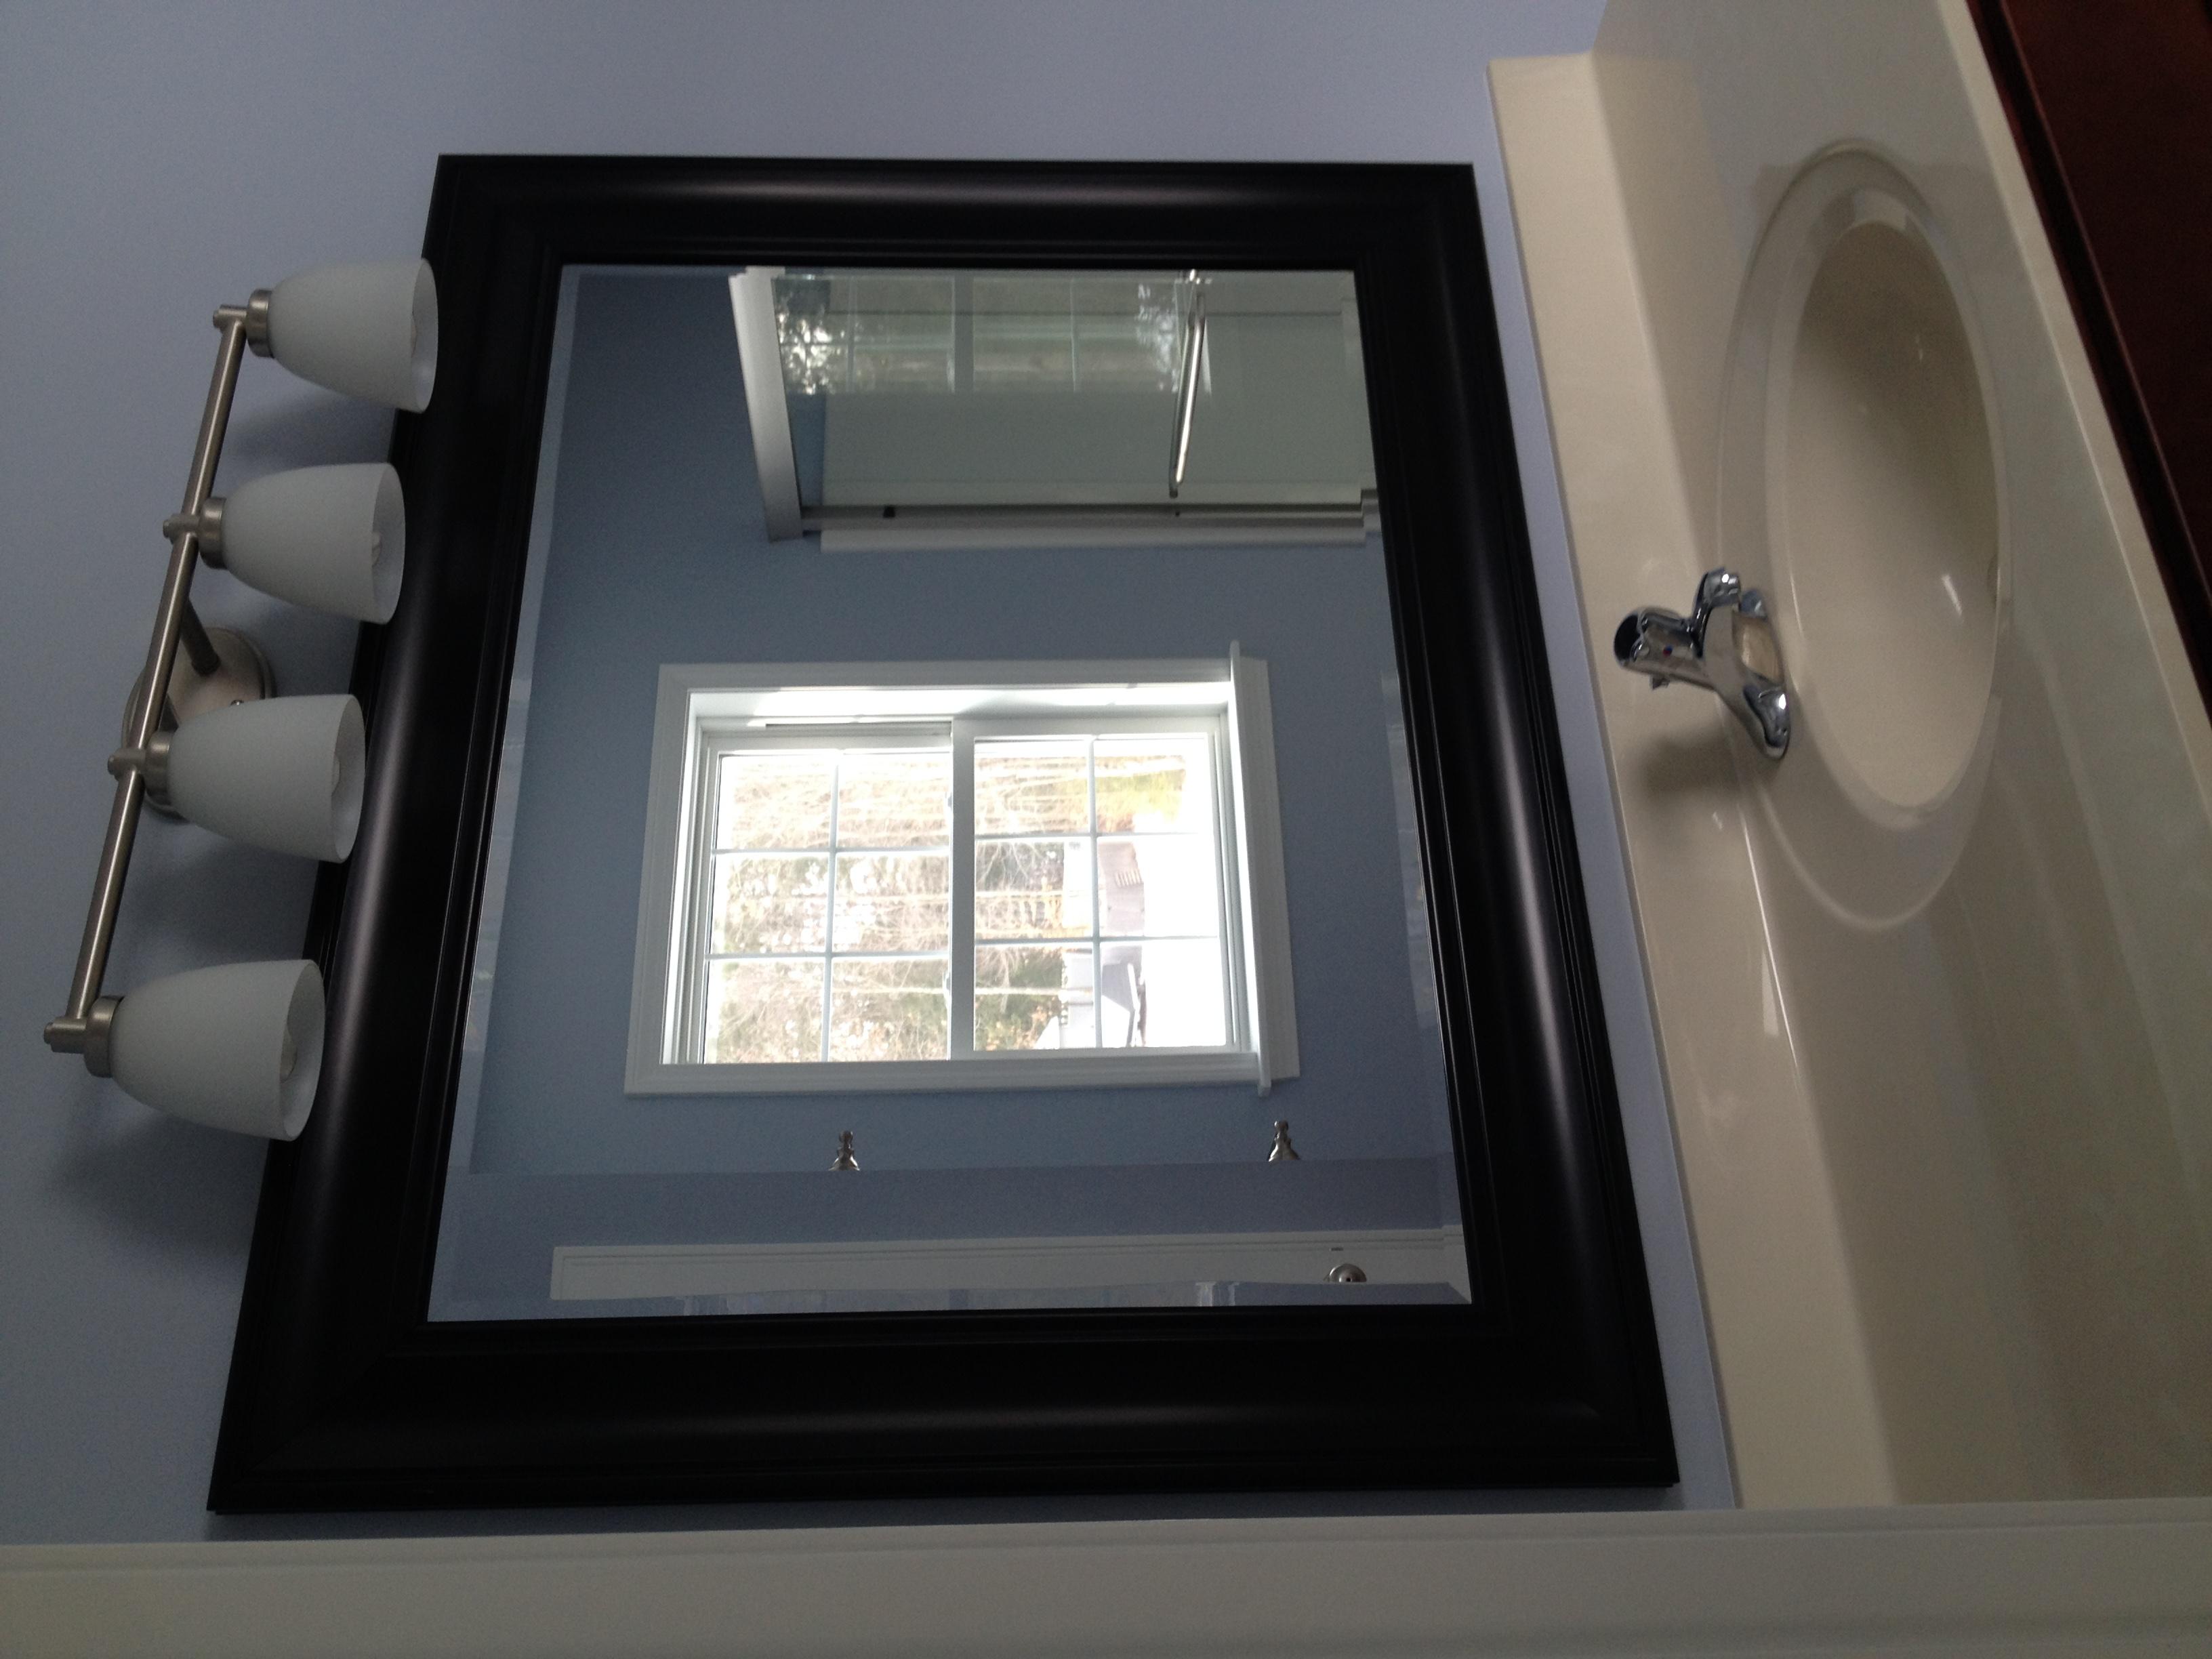 Bathroom mirror and light